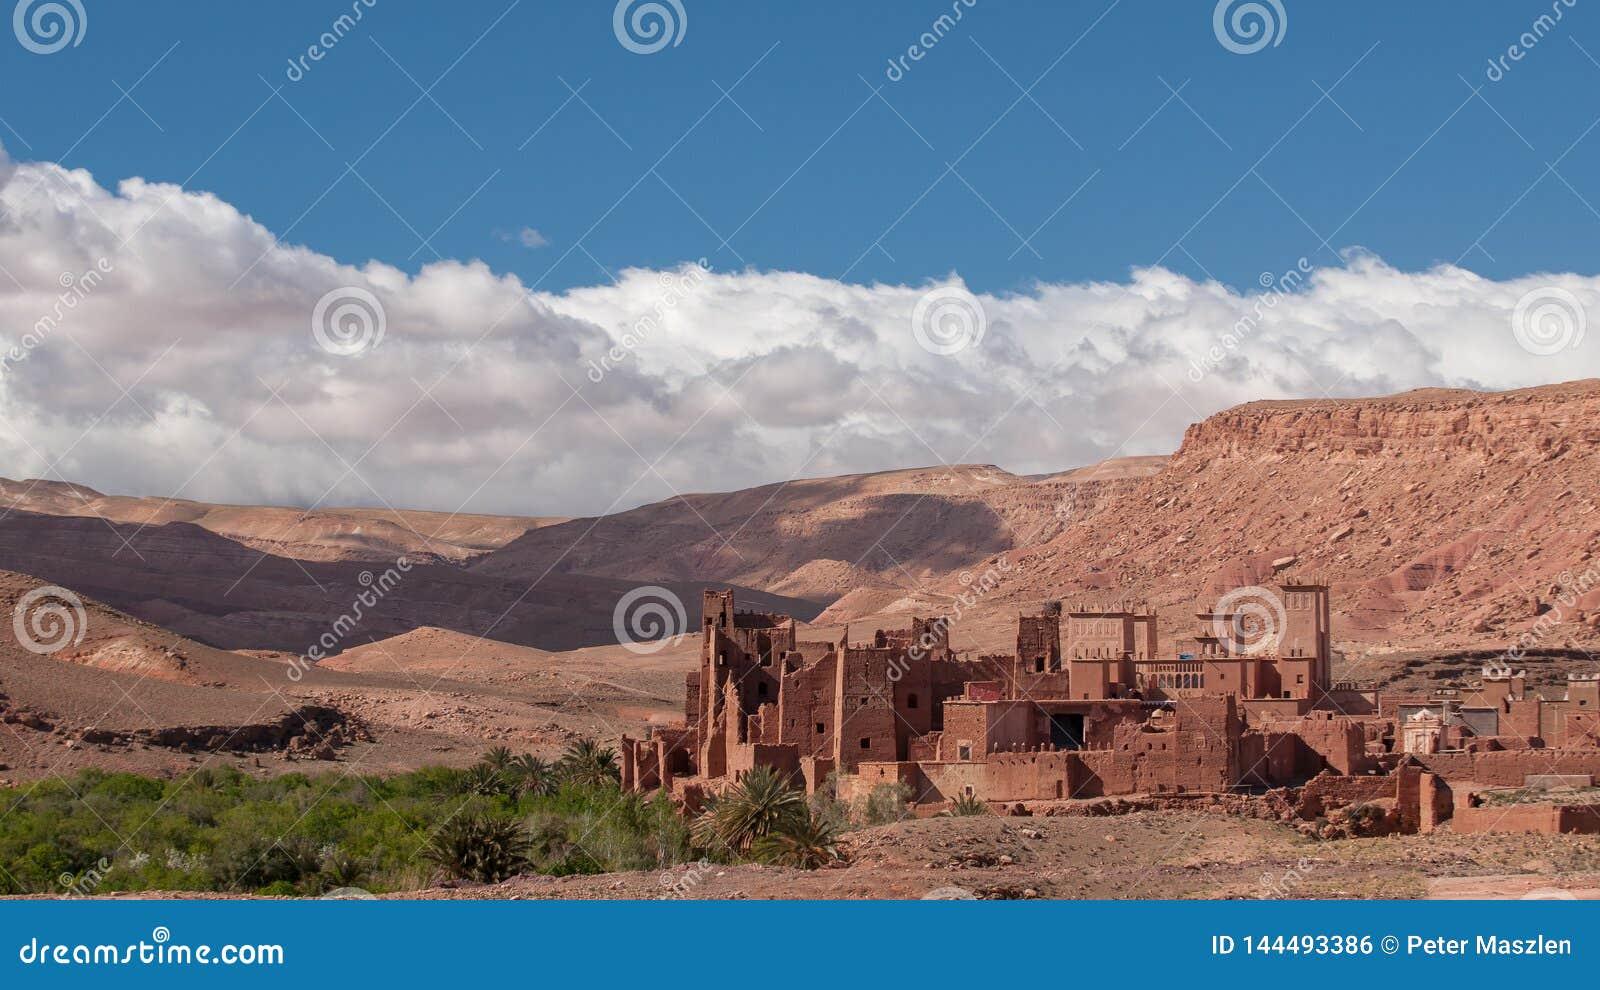 Old Kasbah village in the desert of Morocco